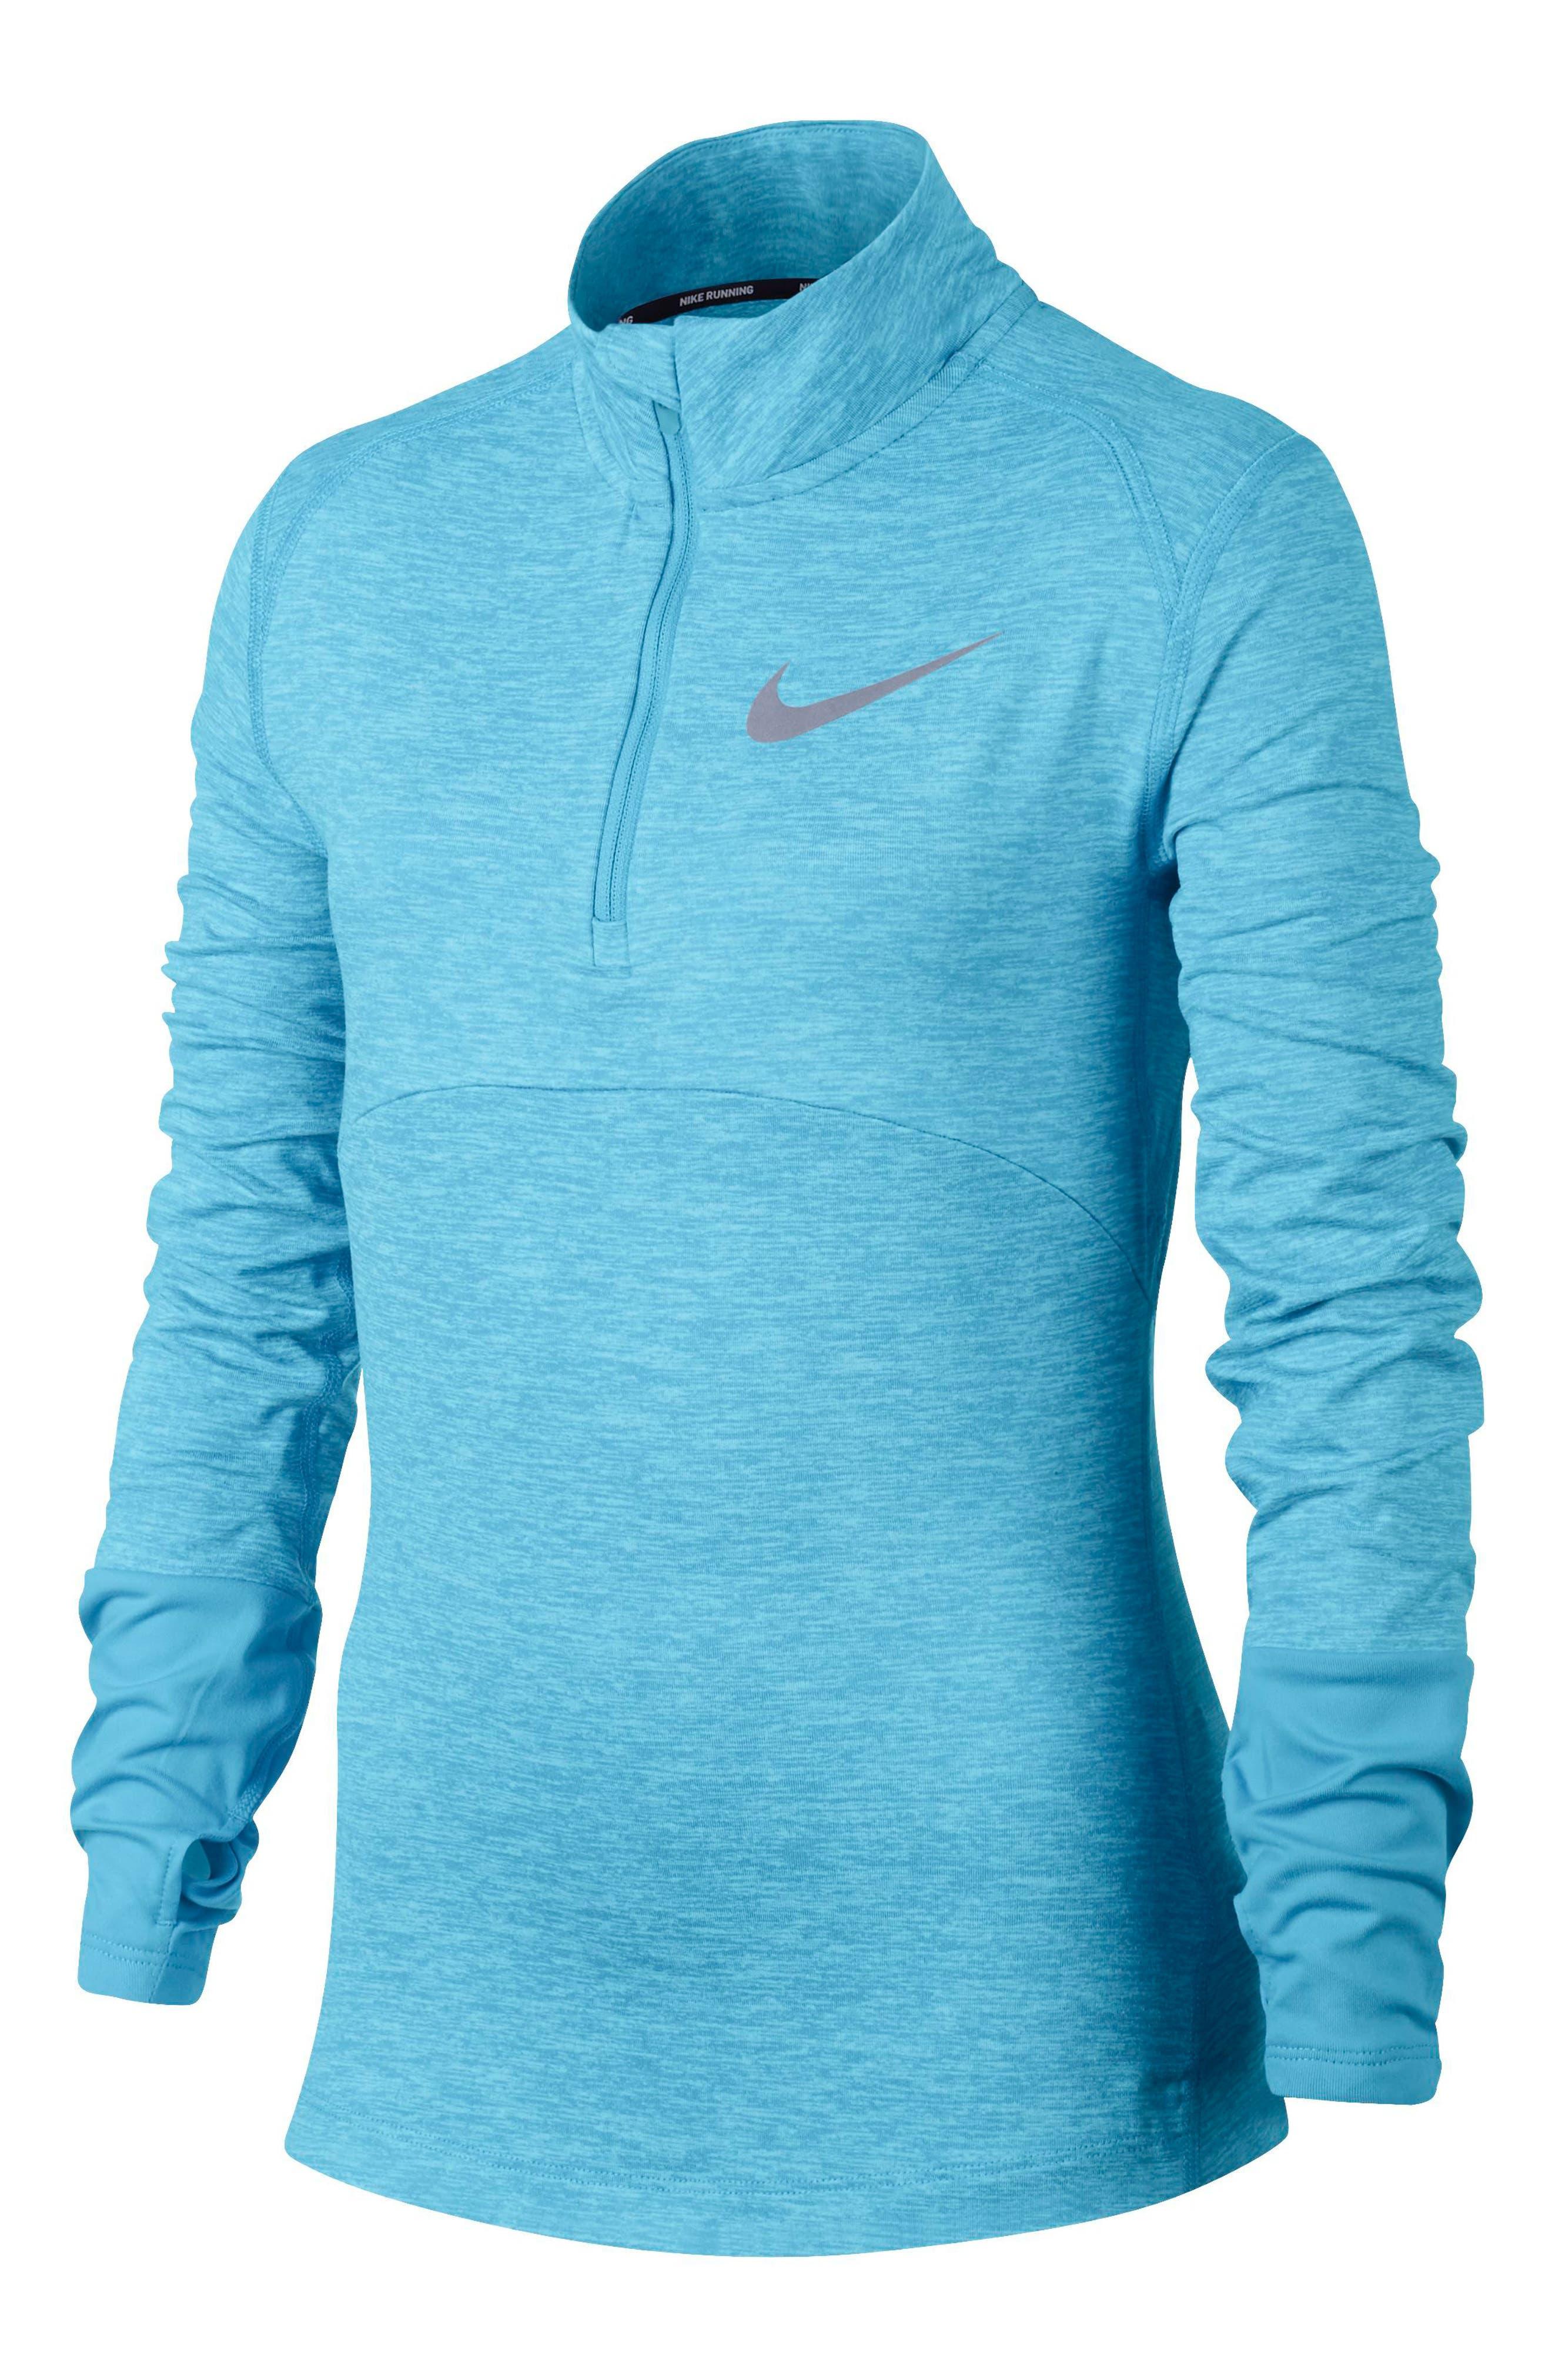 Alternate Image 1 Selected - Nike Dry Element Running Top (Big Girls)